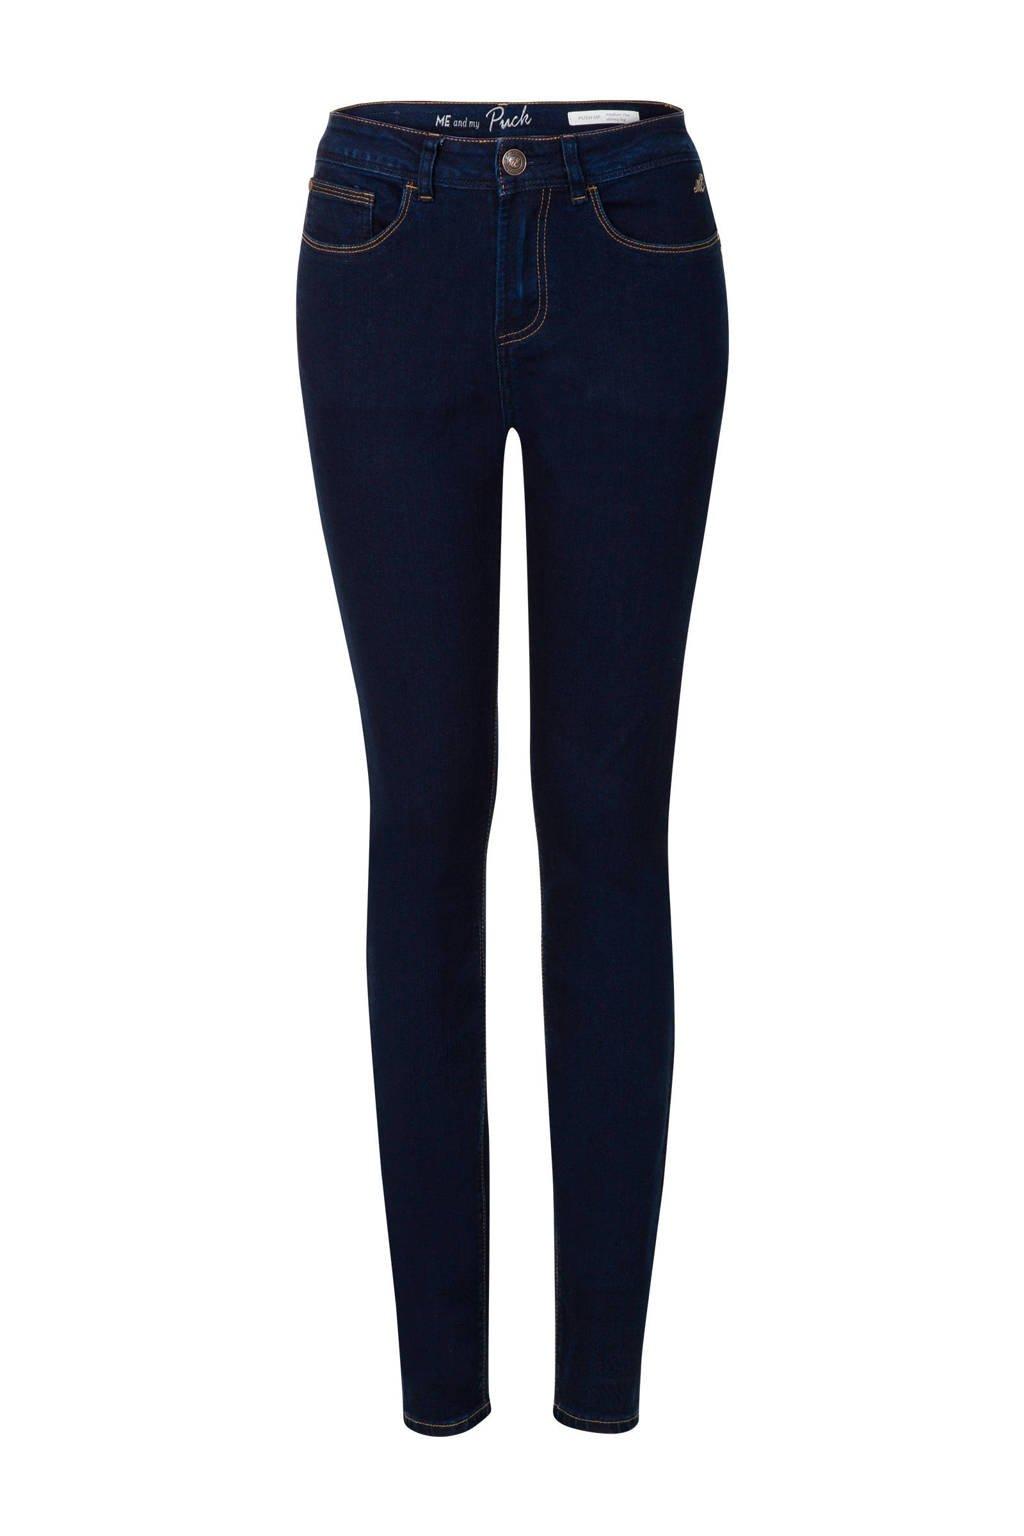 Miss Etam Lang skinny jeans Puck 36 inch, Donkerblauw